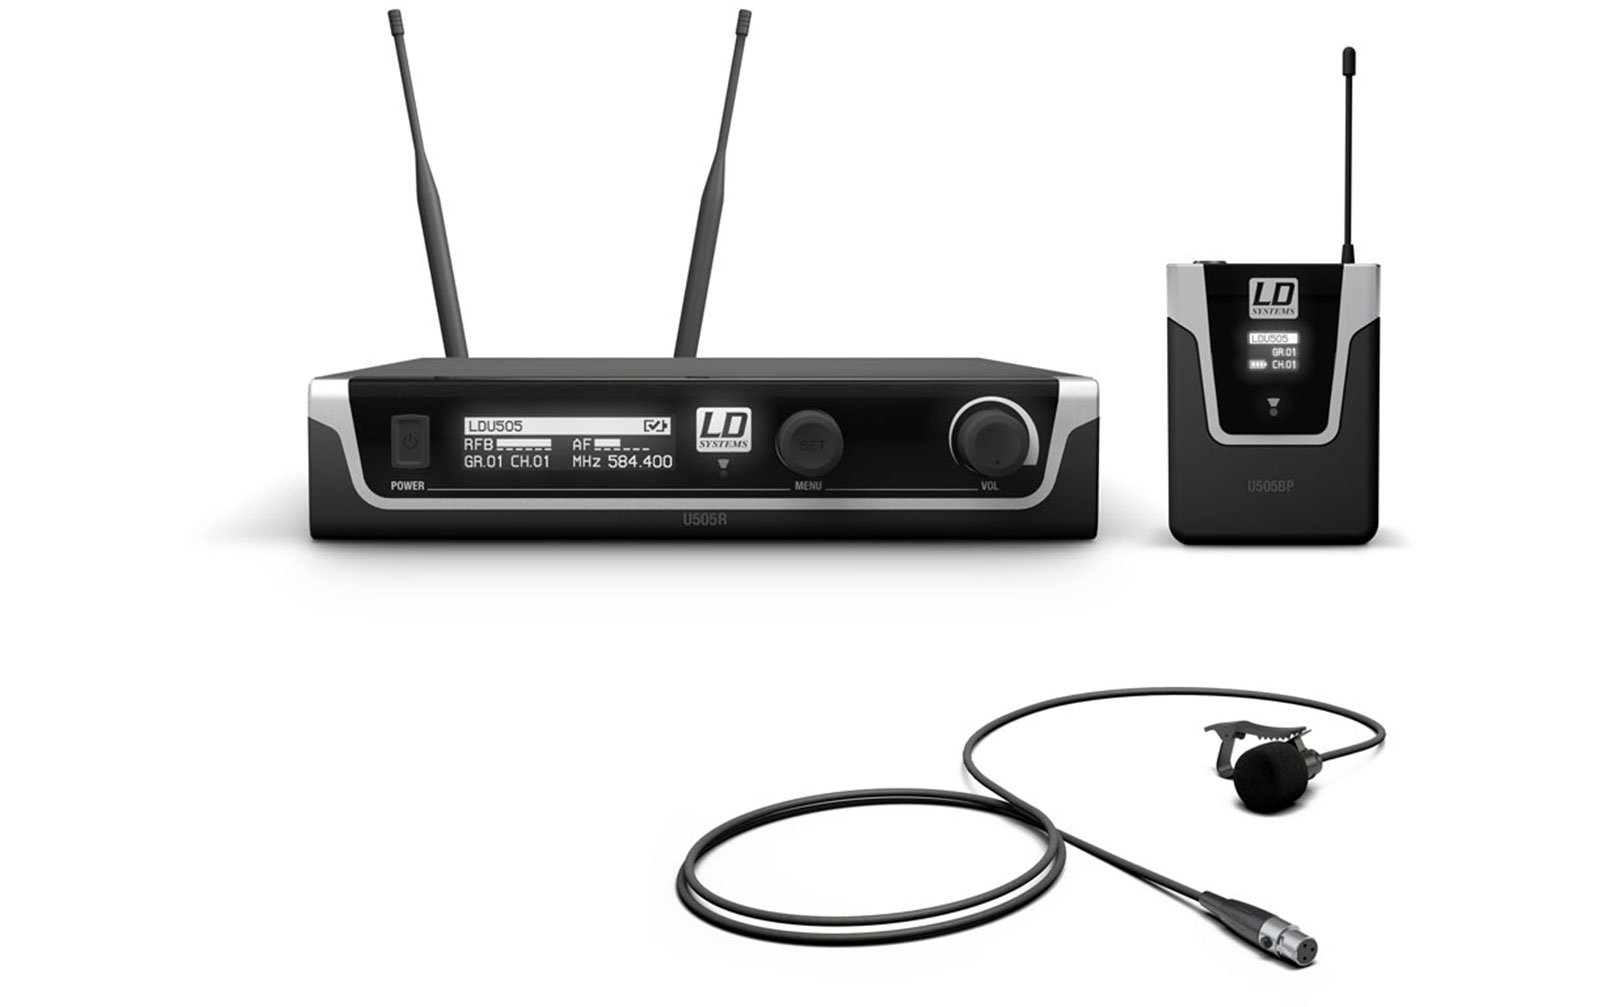 ld-systems-u505-bpl-funkmikrofon-system-mit-bodypack-und-lavalier-mikrofon